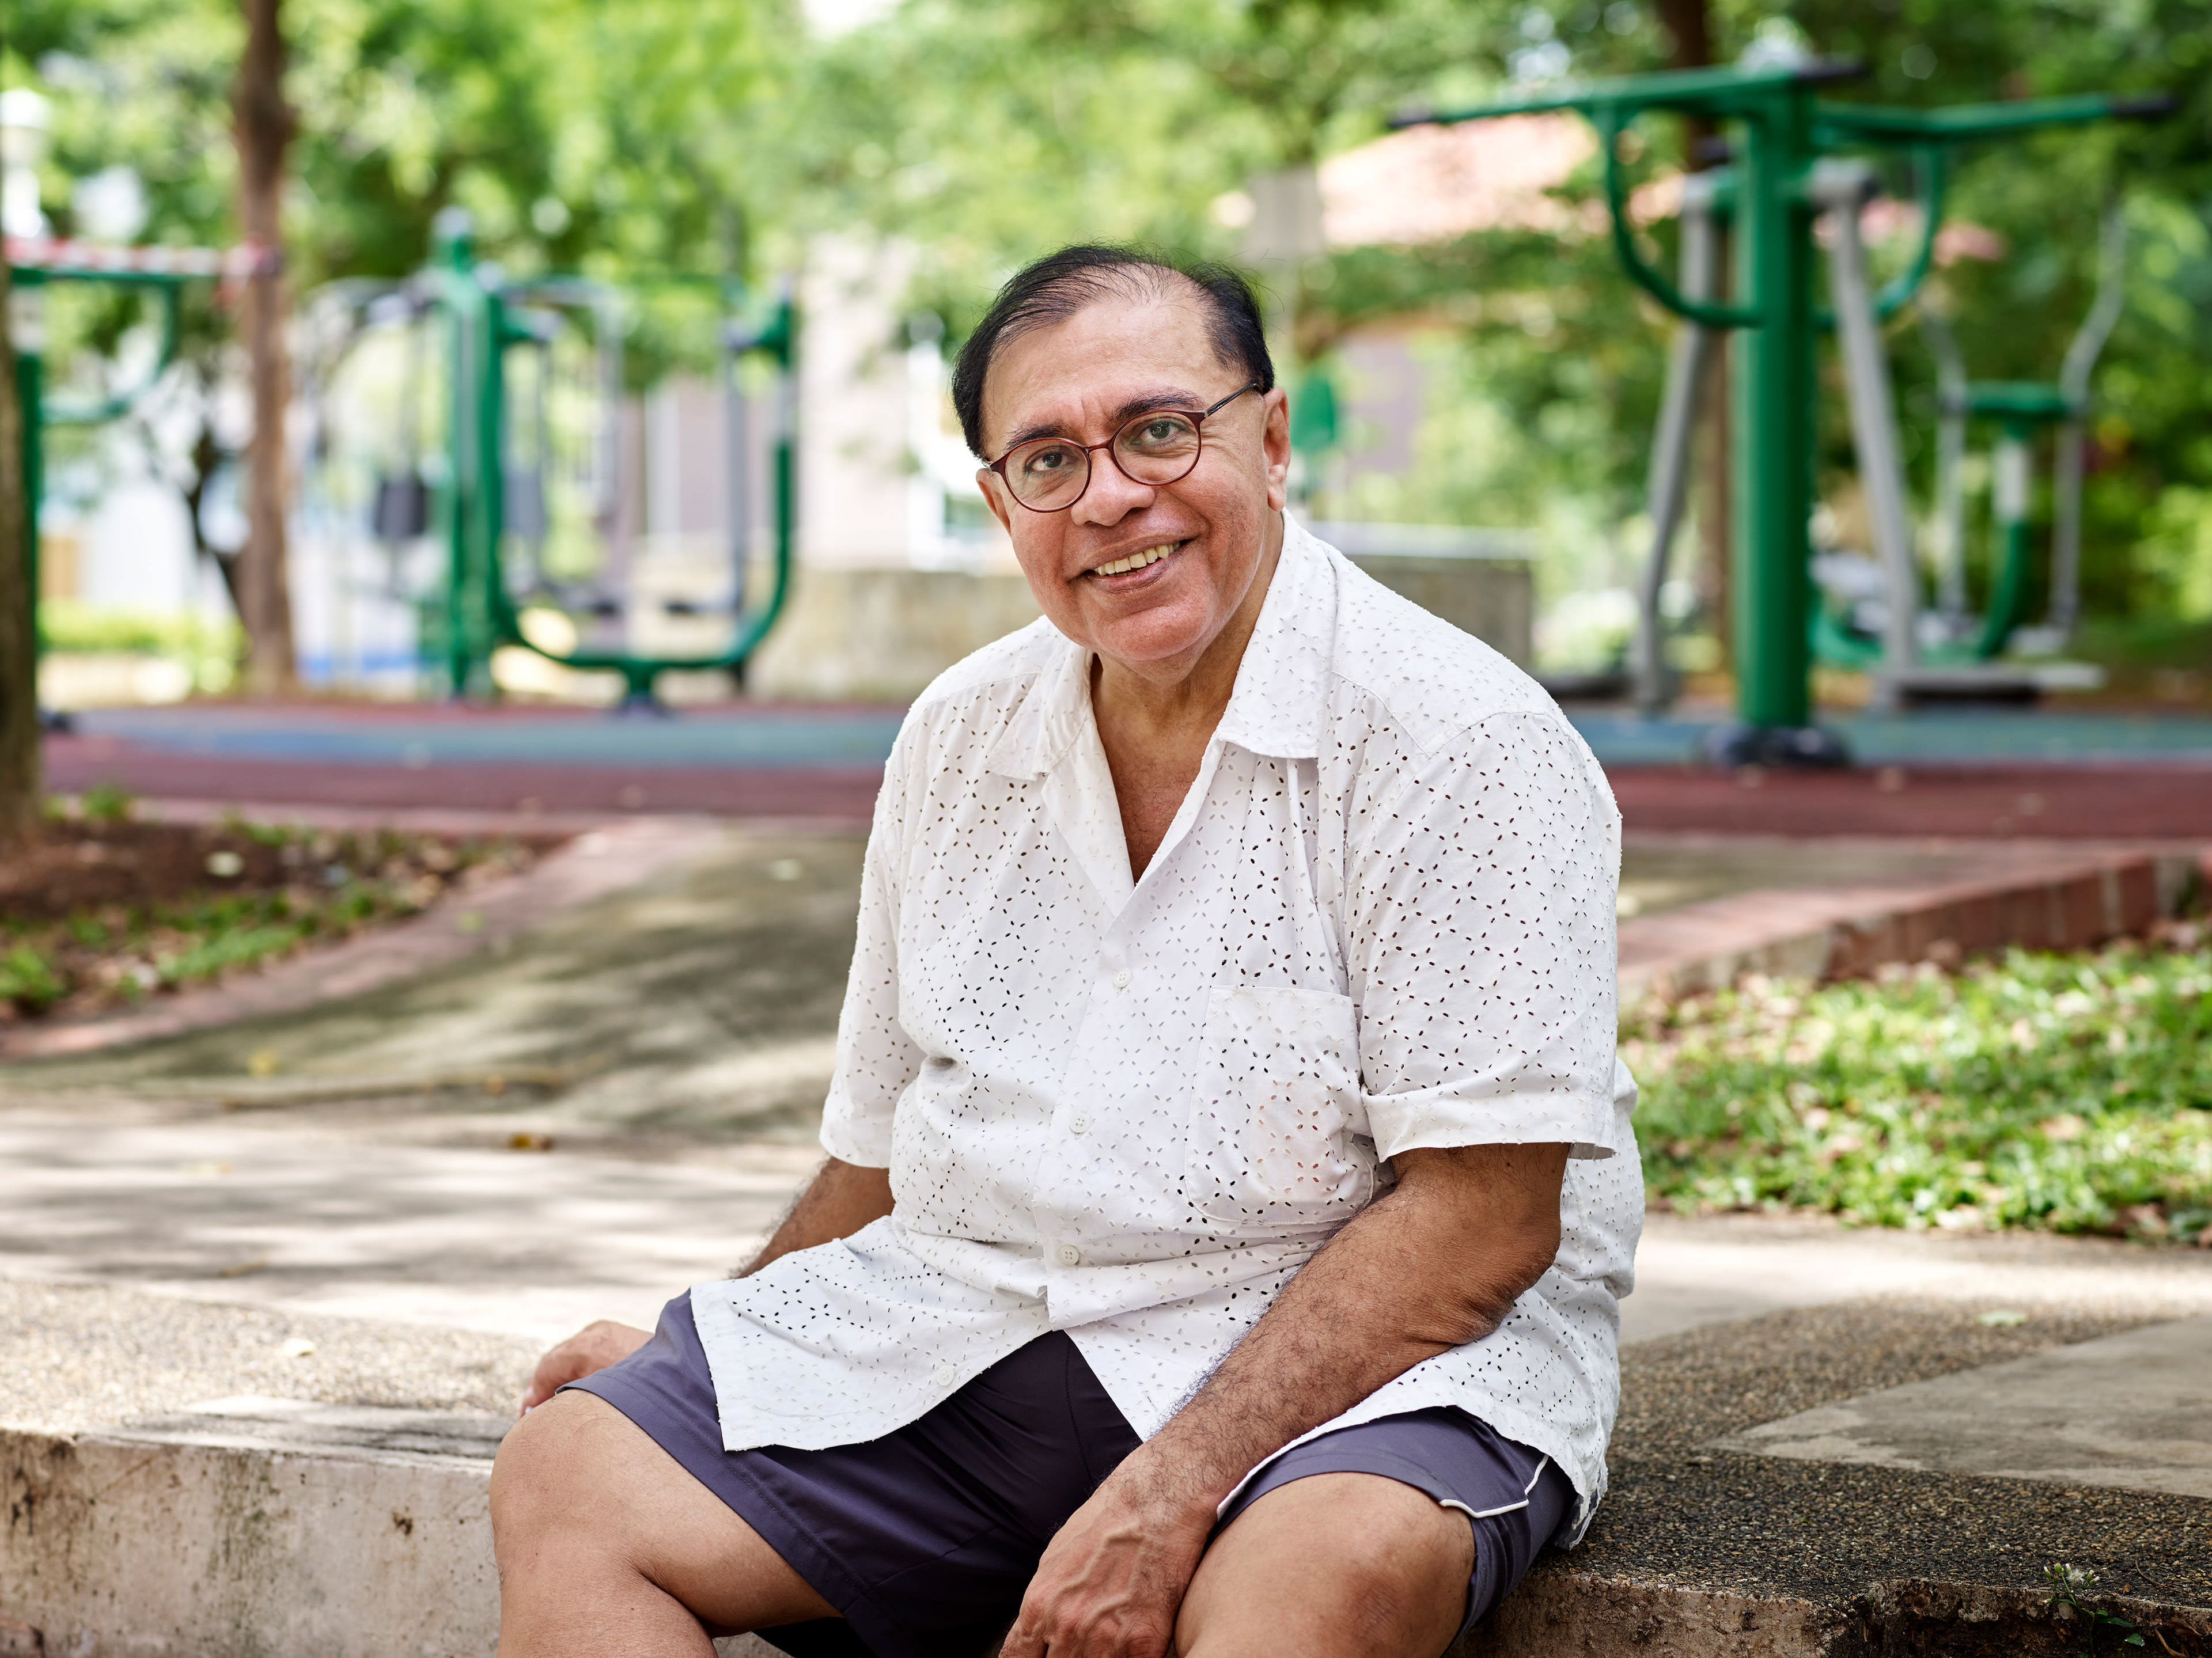 Richard Moran GSK Global Stories Lifestyle Pharma 045